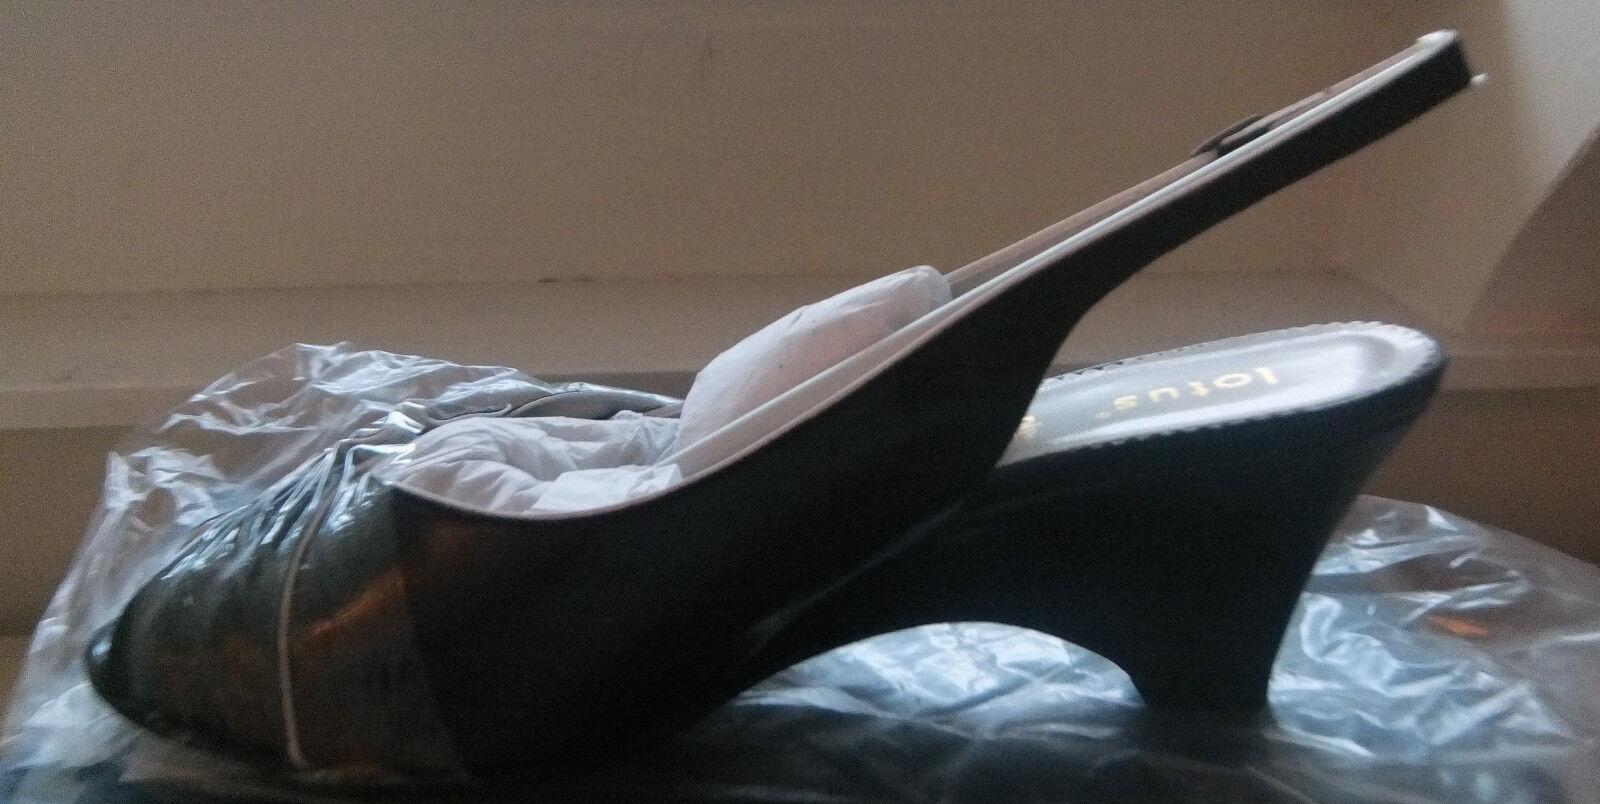 Vendita Nuovo Scarpe A Punta Aperta Aperta Aperta Nero N Bianco UK9 EE Larghezza, NUOVO, in scatola 245f97